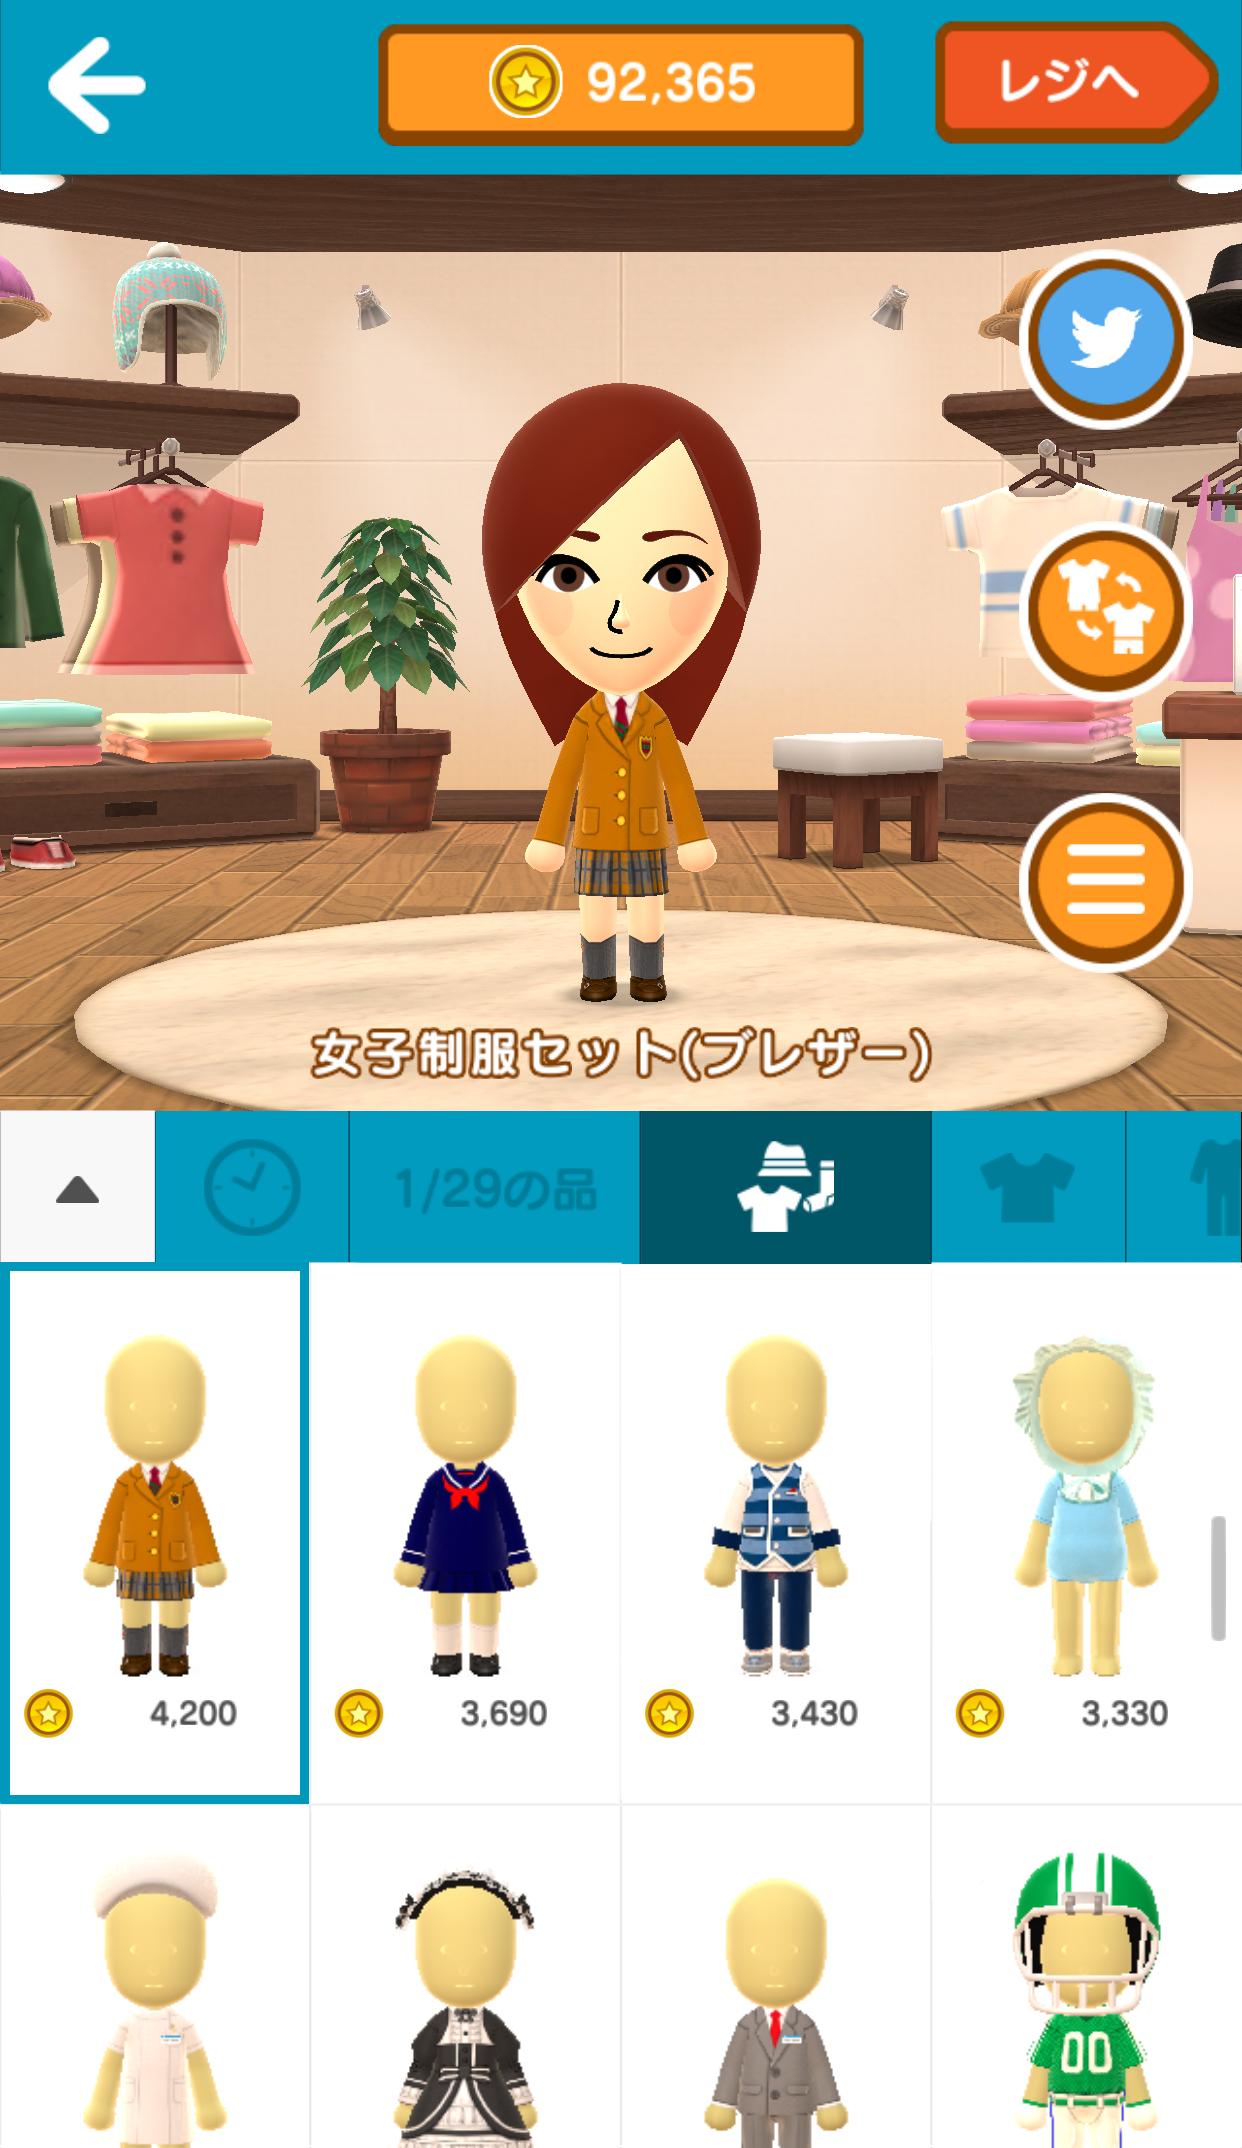 Miiの服は自由にコーディネートできる